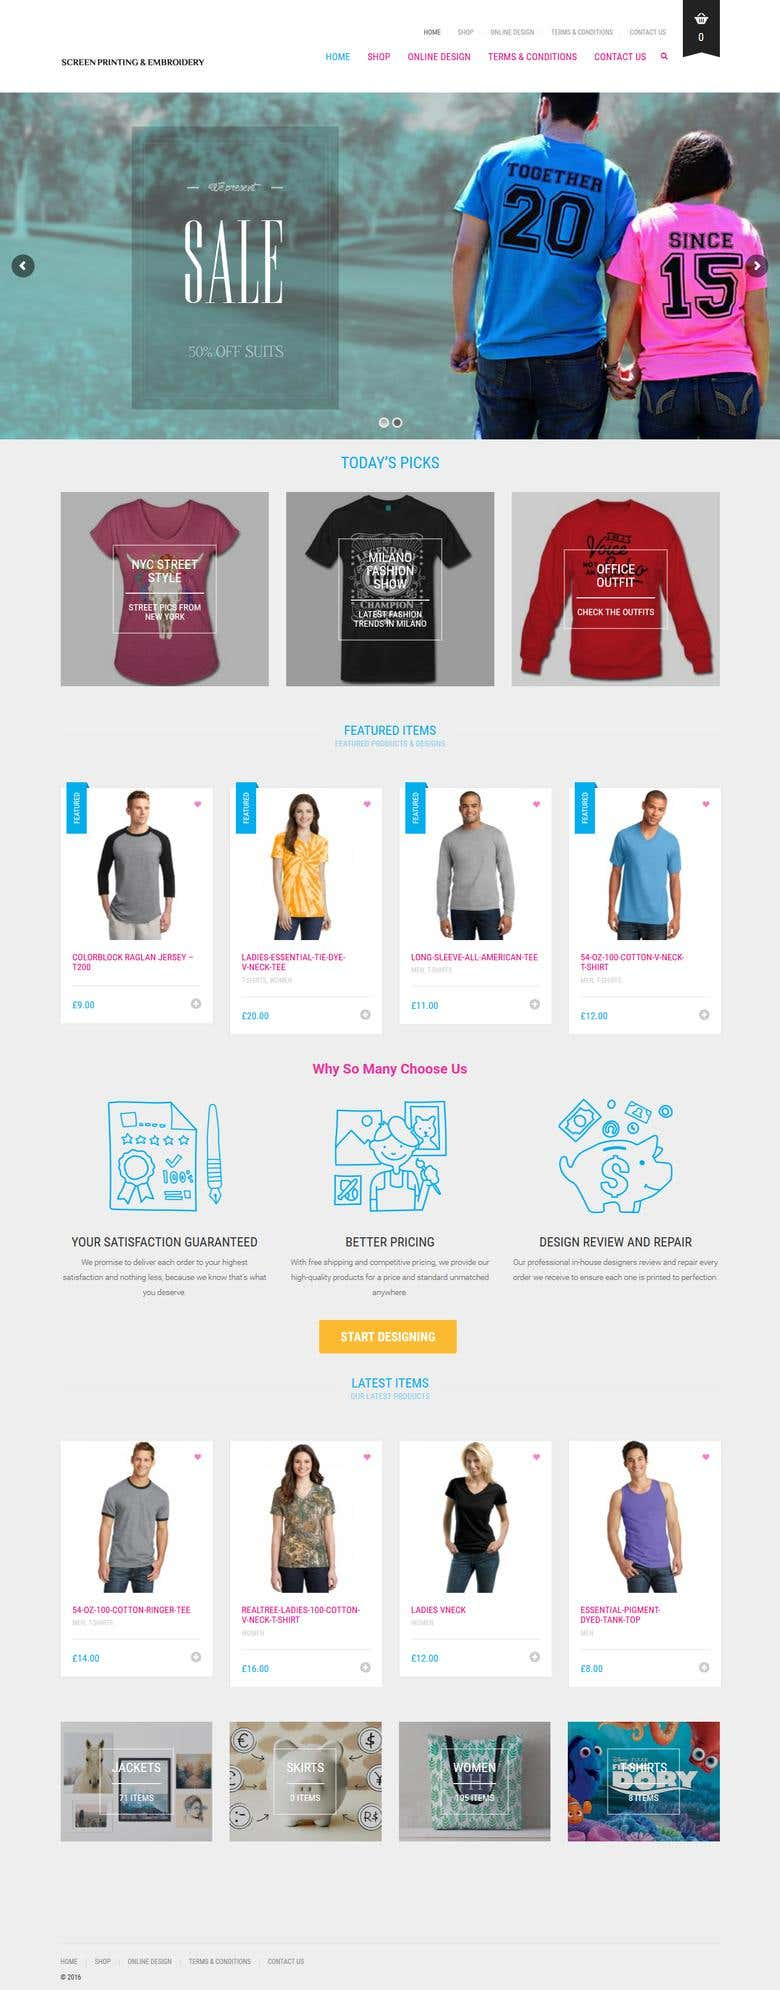 Screen Printing - Online Product Designer   Freelancer